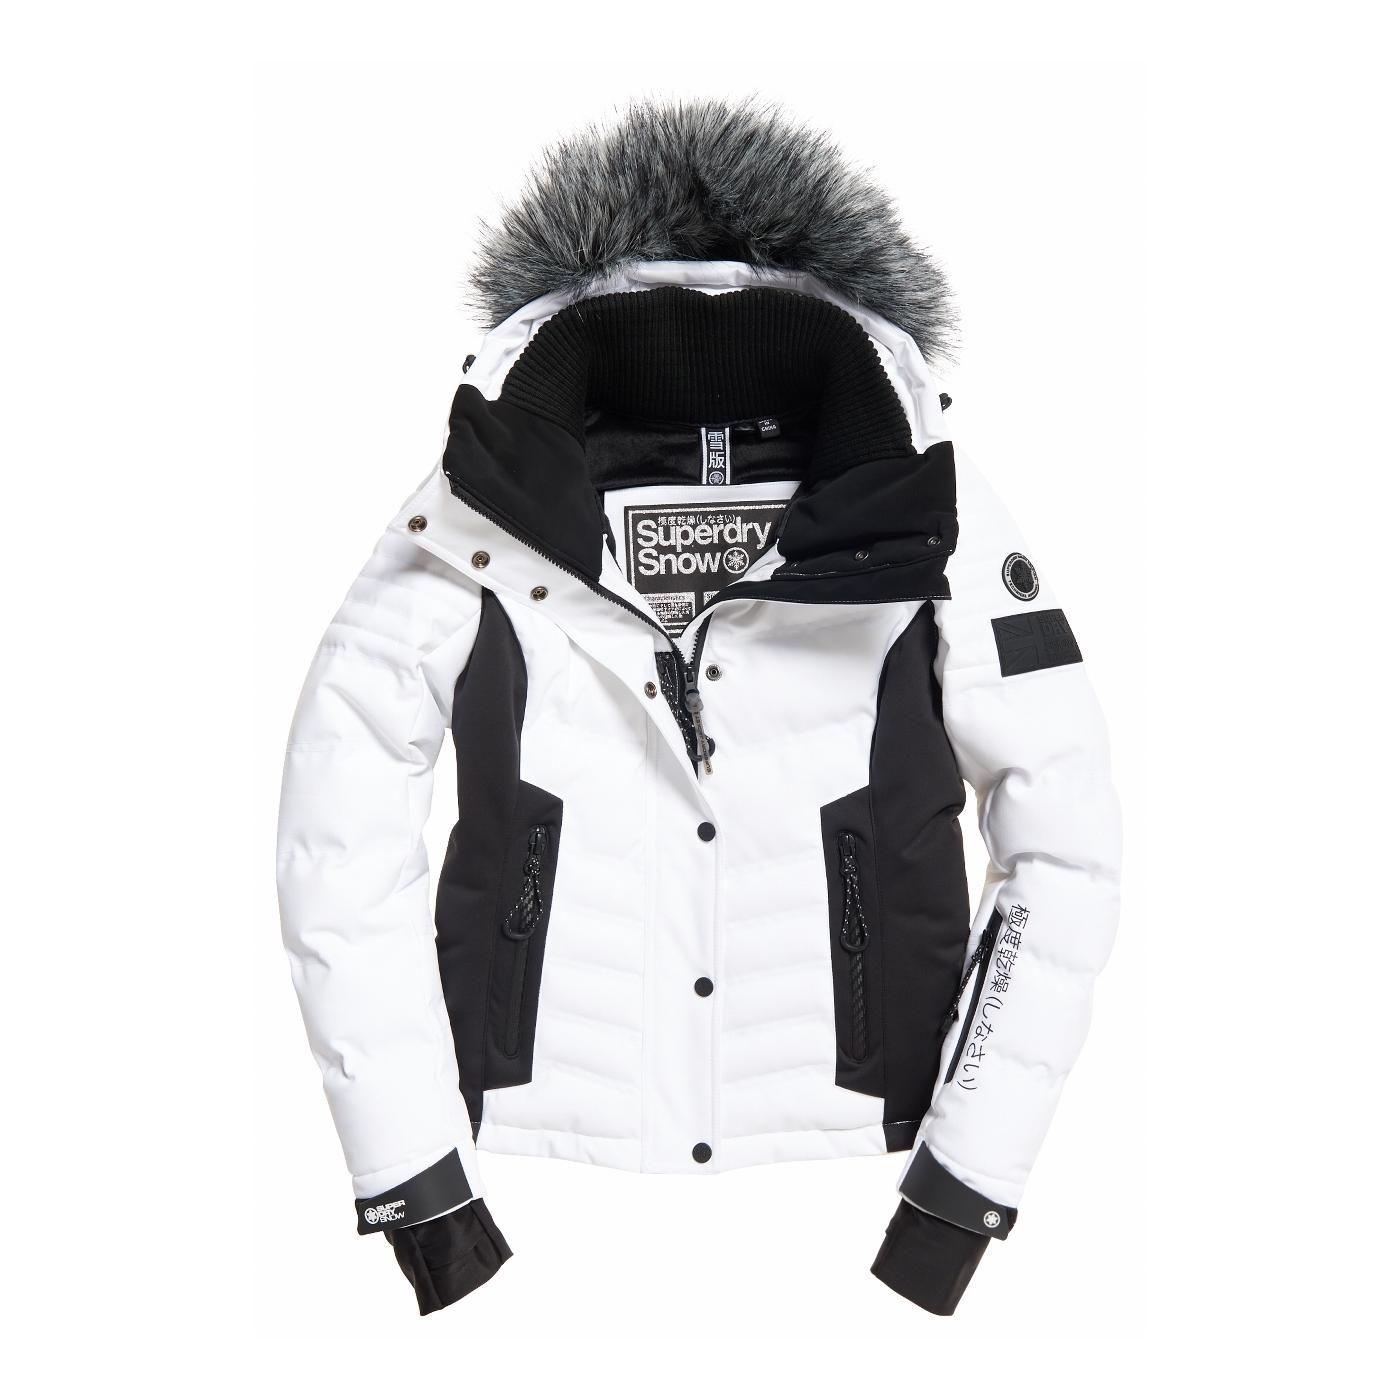 Optic Veste Superdry De Snow Luxe Puffer Ski dqrqBYEw